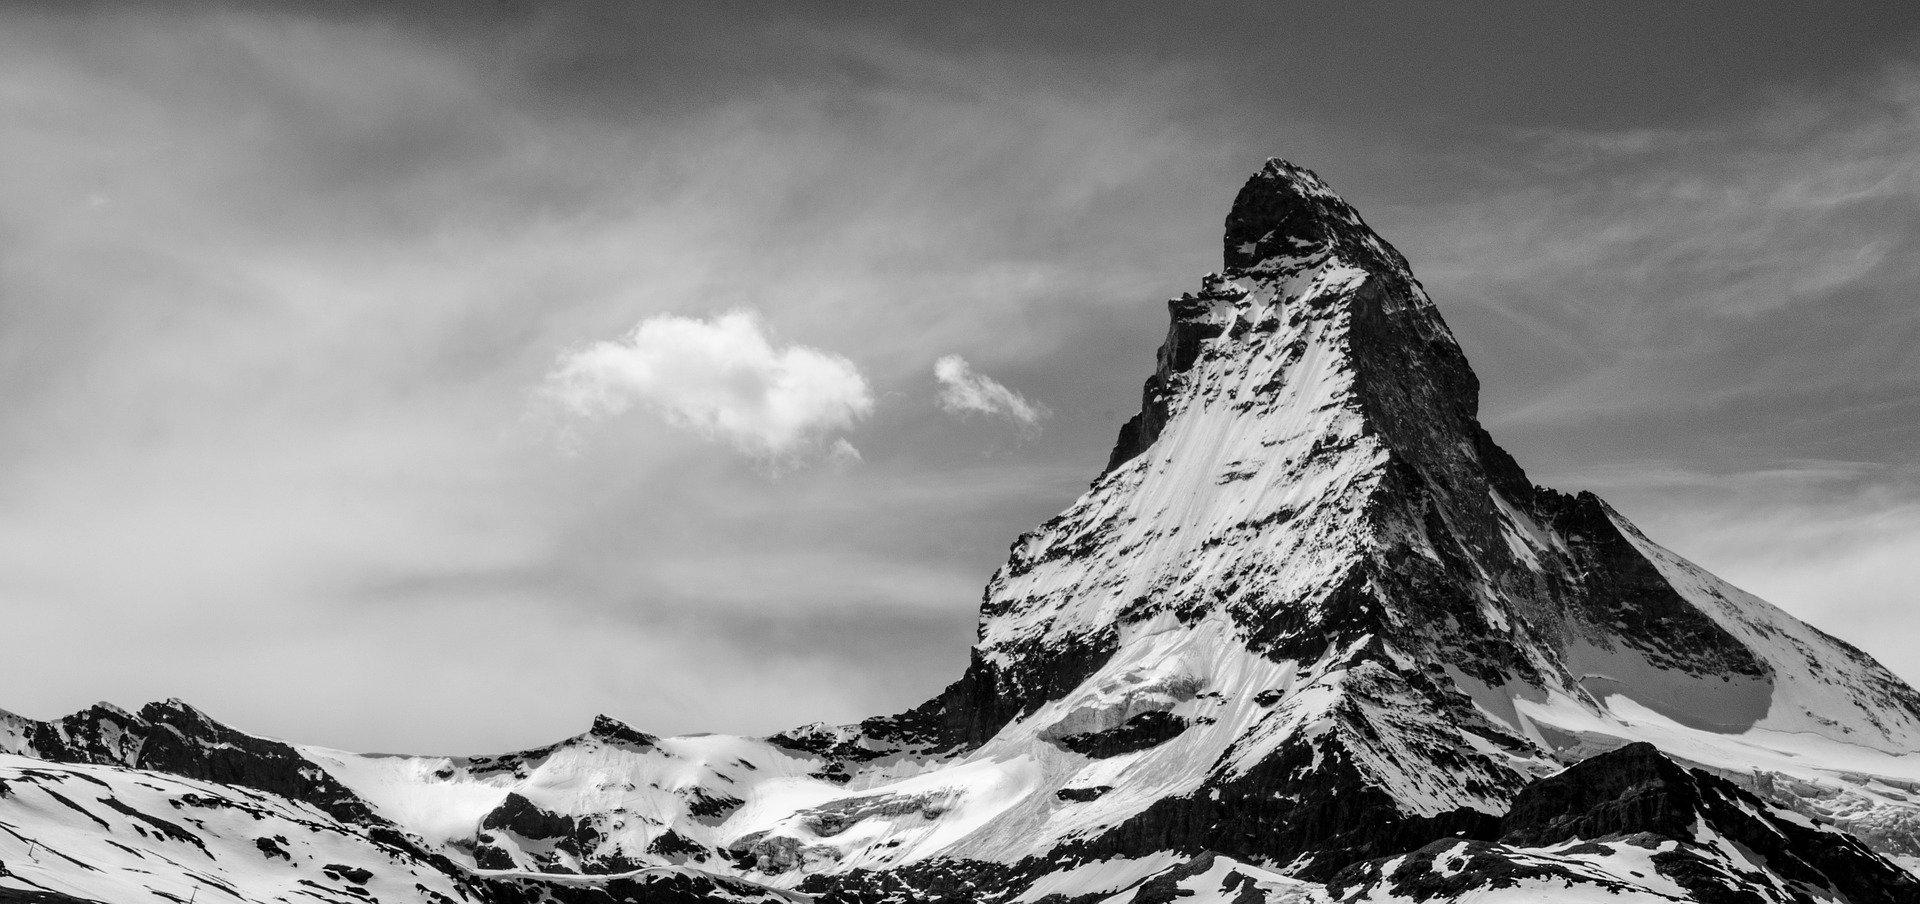 Matterhorn schwarzweiß